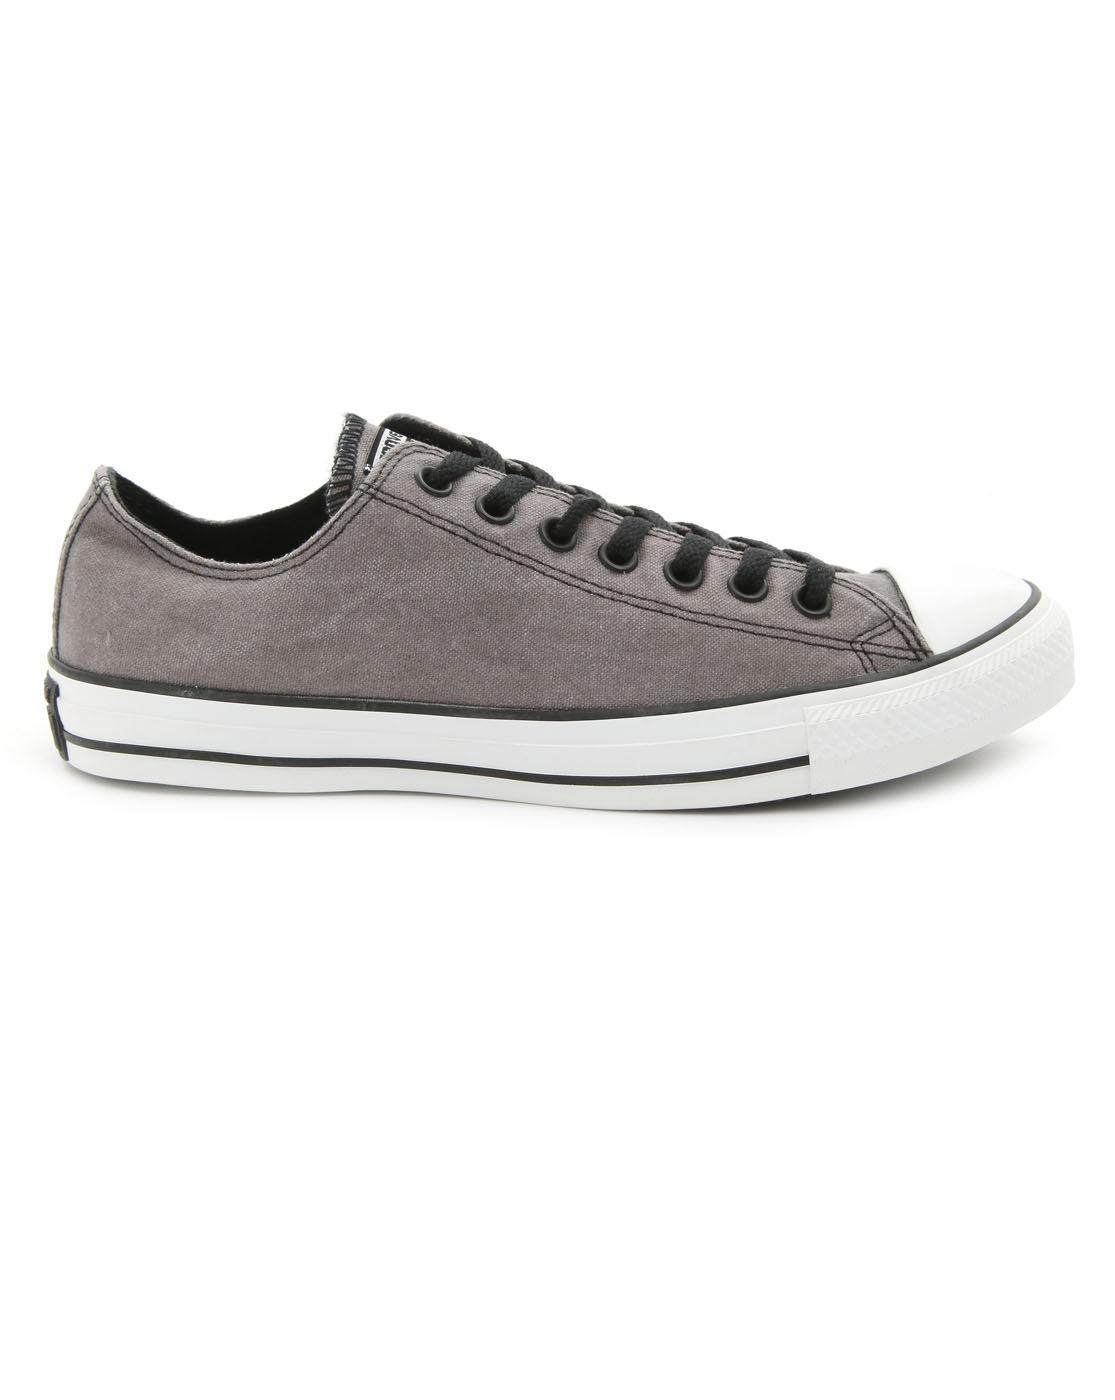 converse all star low vintage dark grey sneakers in gray. Black Bedroom Furniture Sets. Home Design Ideas